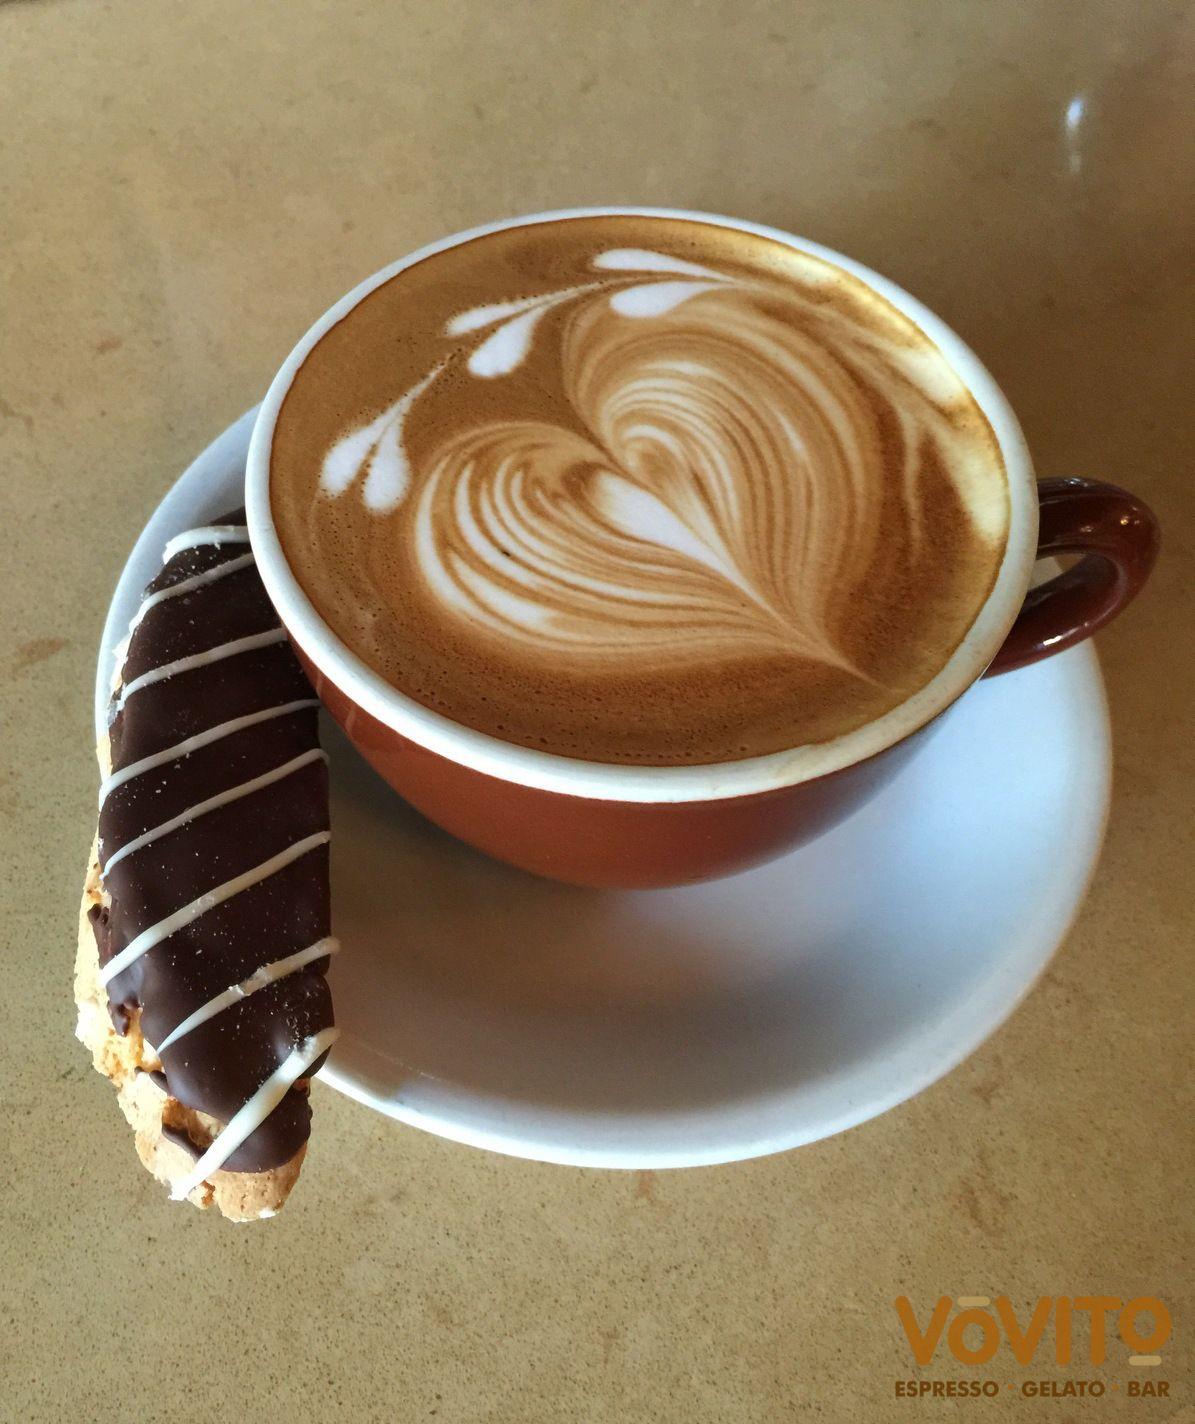 Beautiful Latte Art By Matt At Vovito Bellevue Coffee Recipes Latte Latte Art